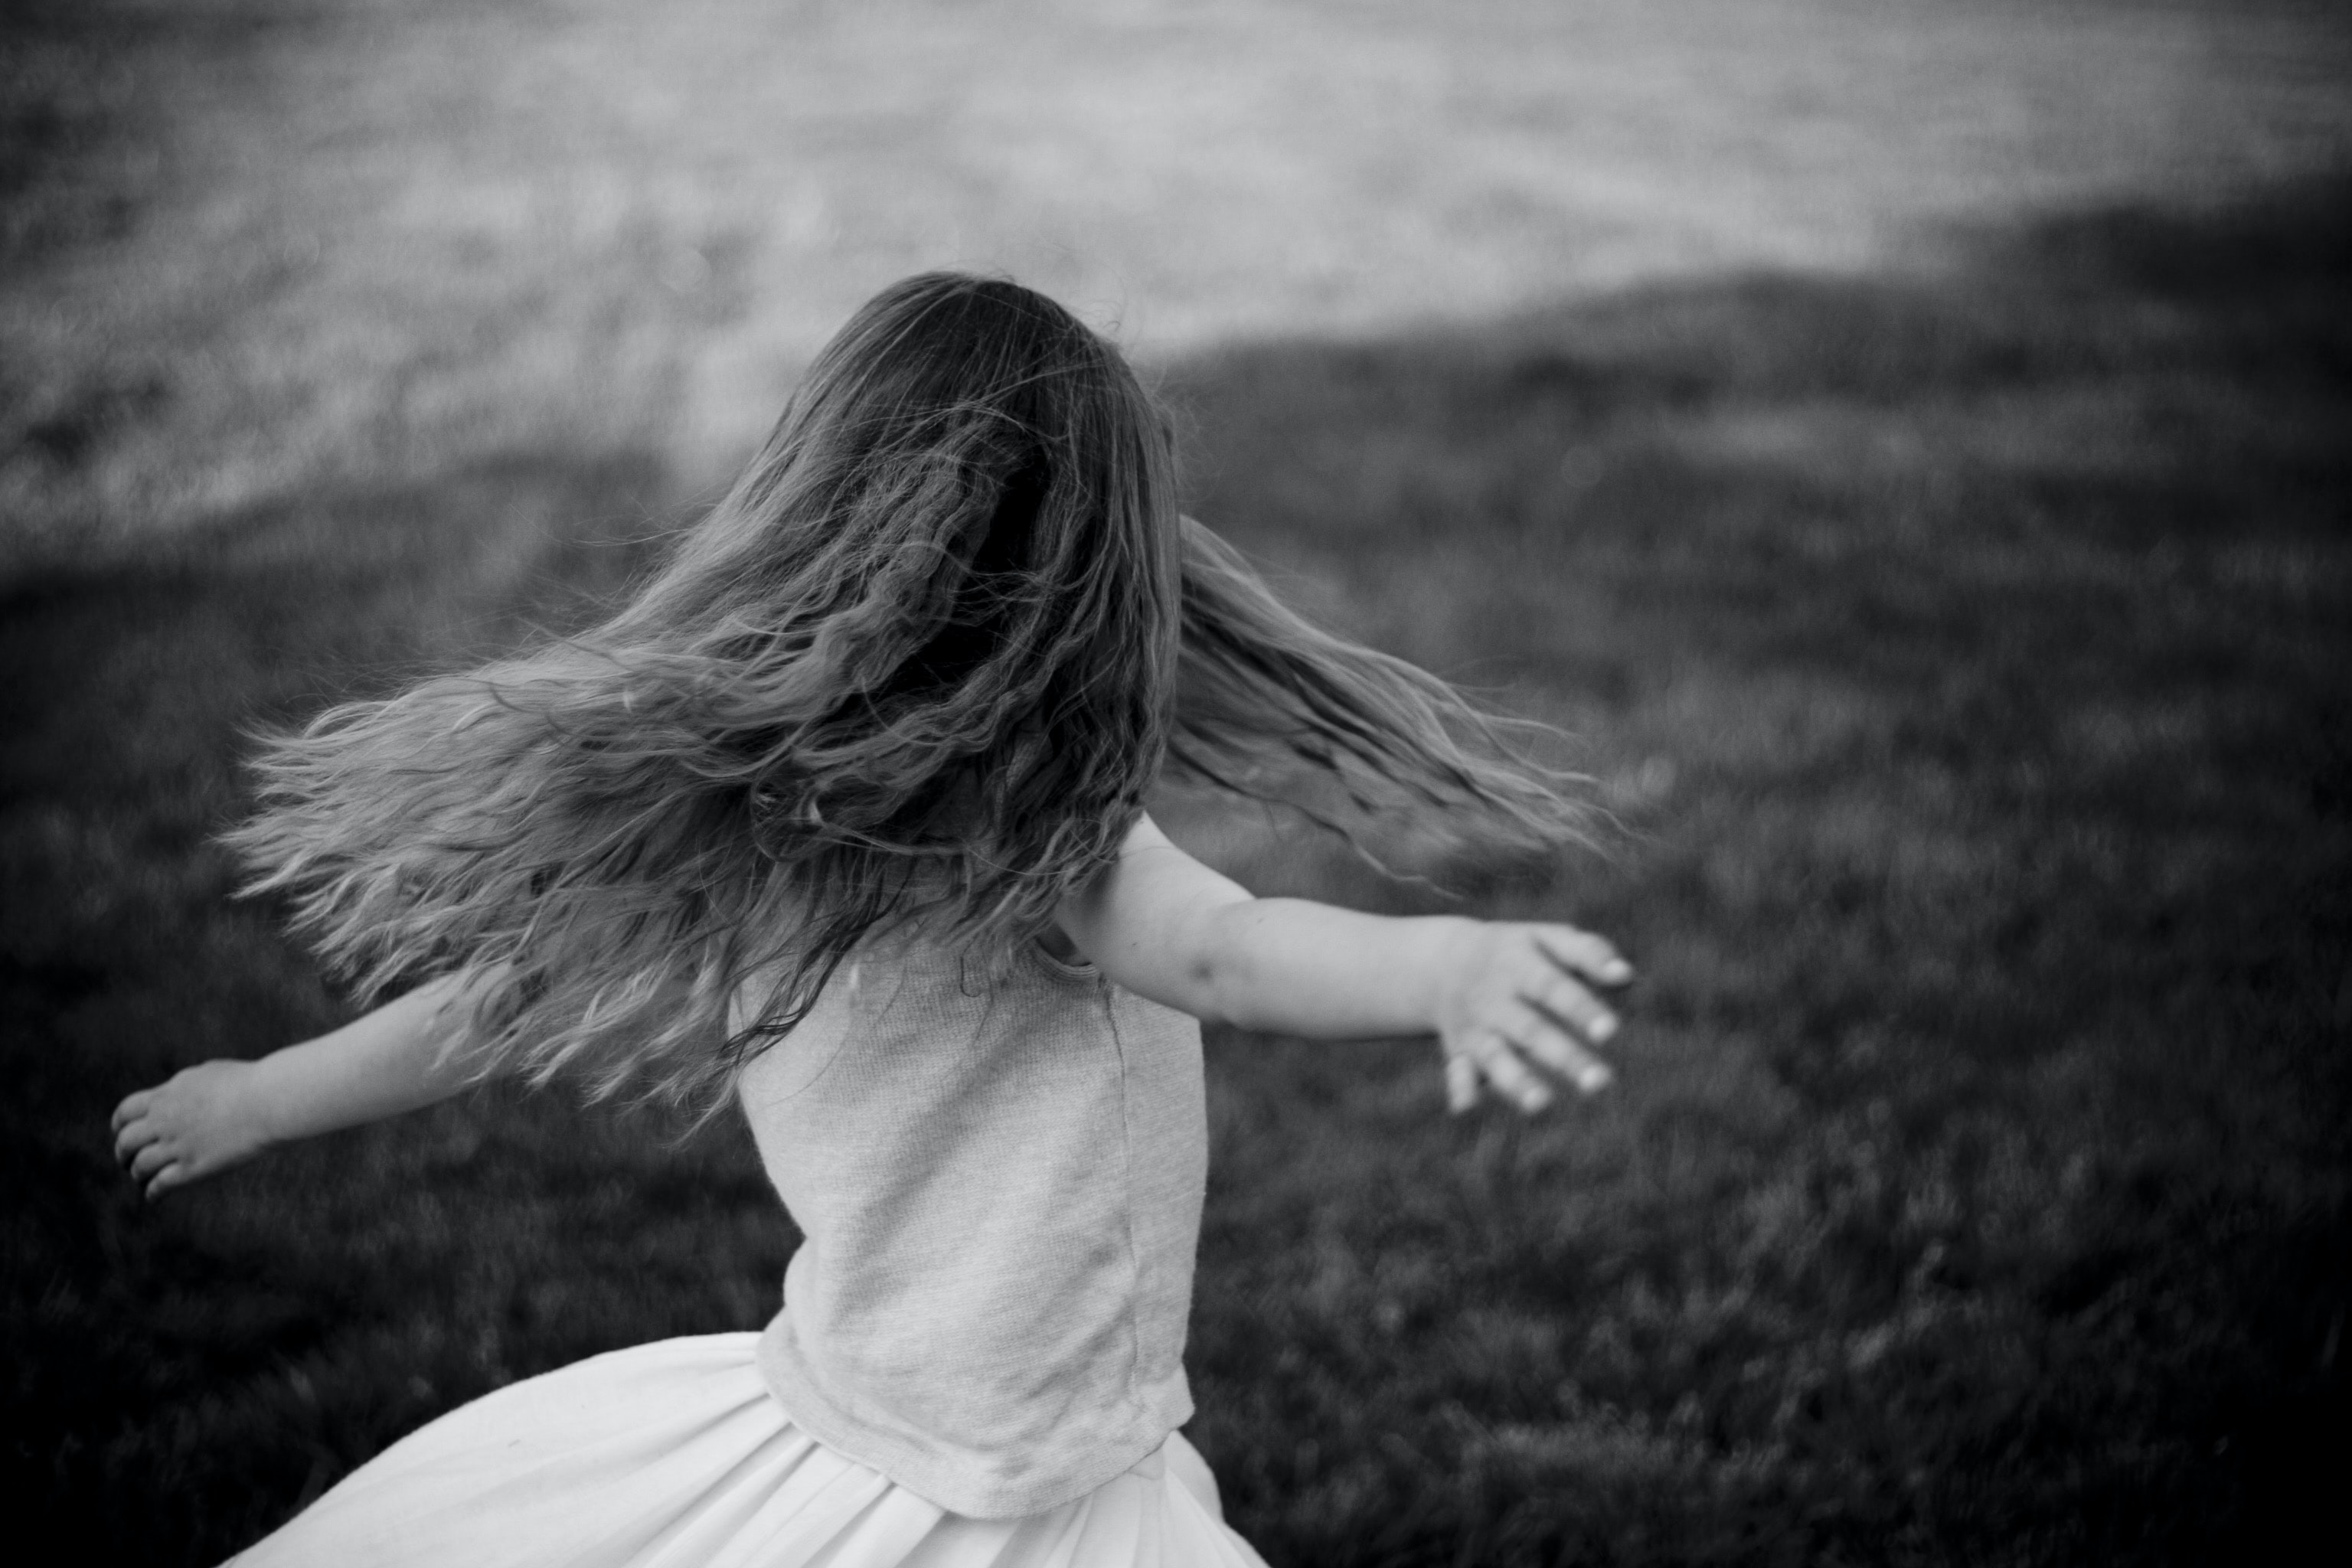 grascale photo of a girl near grass